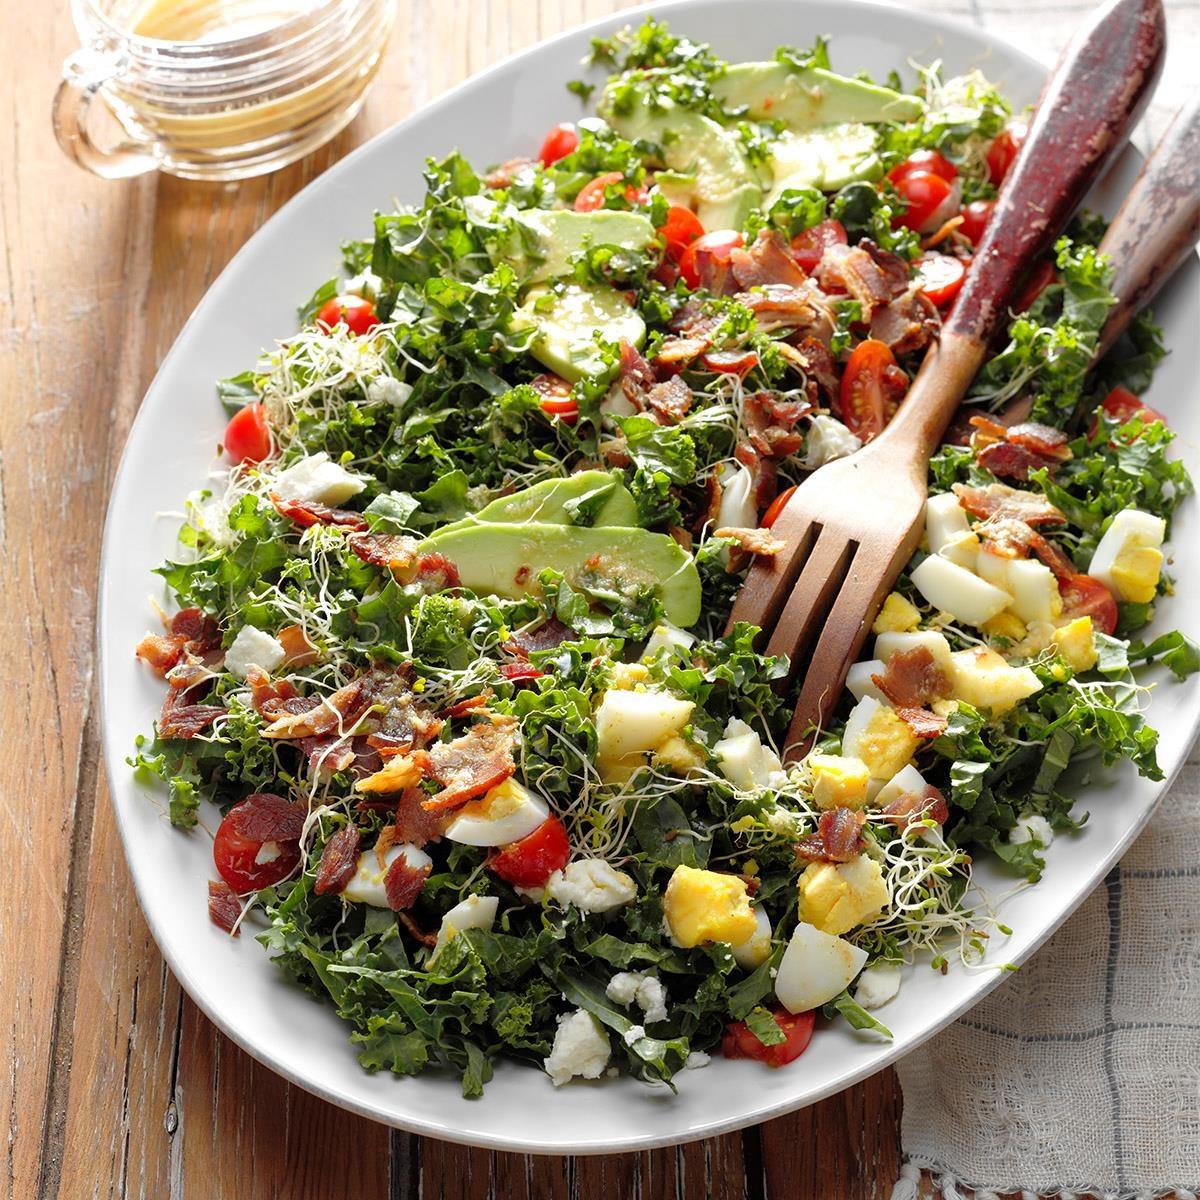 Oklahoma: Kale & Bacon Salad with Honey-Horseradish Vinaigrette